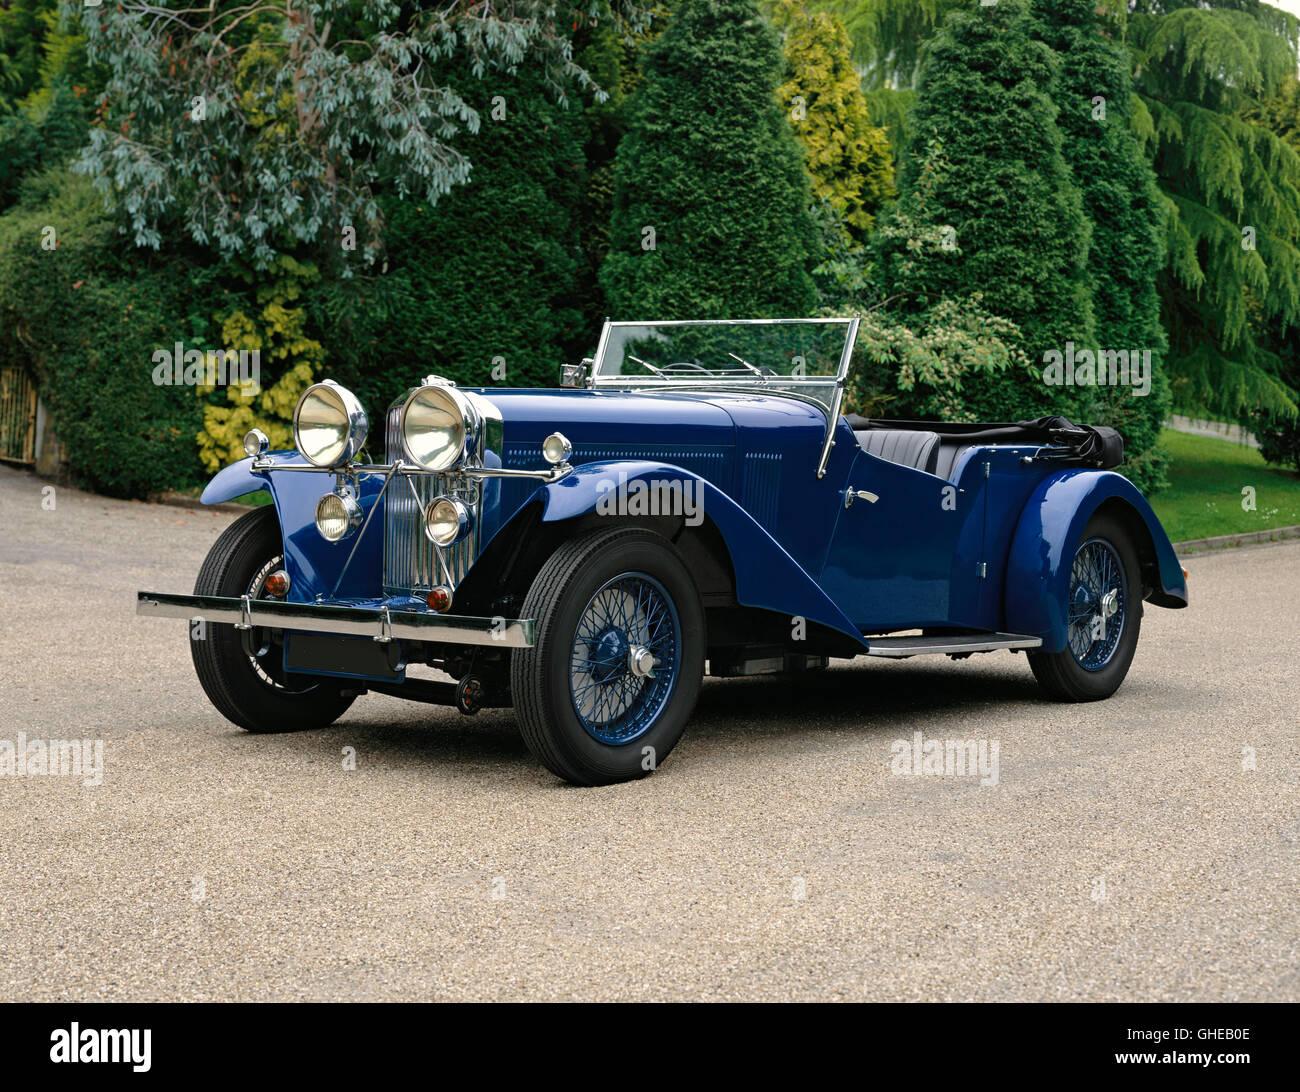 1934 Talbot 105 Vanden Plas tourer 3 0 litre Country of origin United Kingdom - Stock Image